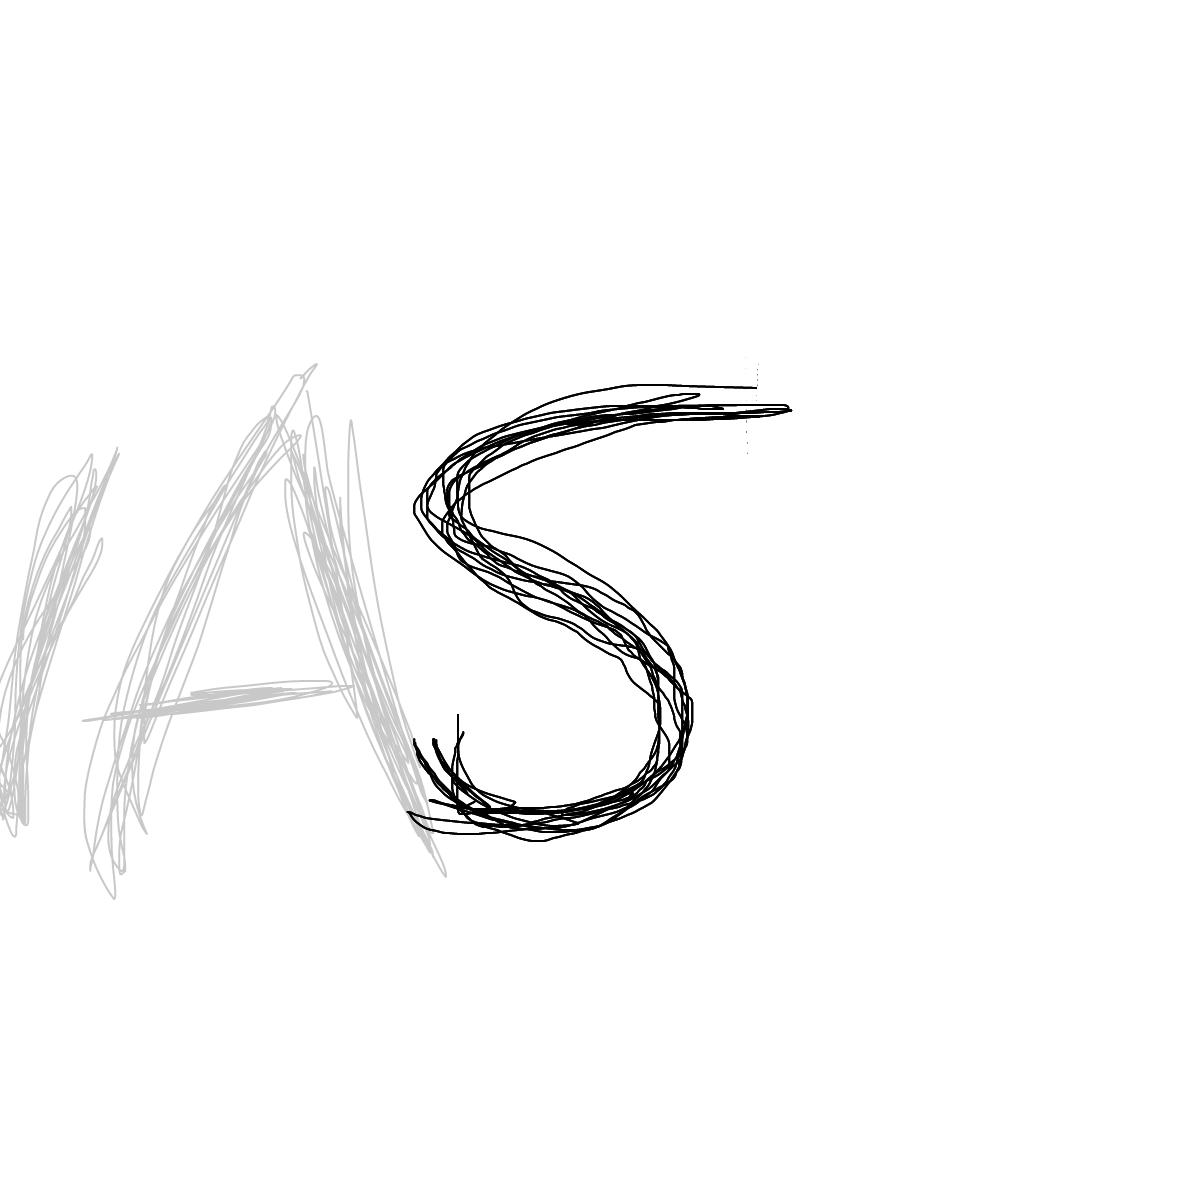 BAAAM drawing#8582 lat:59.9234886169433600lng: 10.7577543258667000